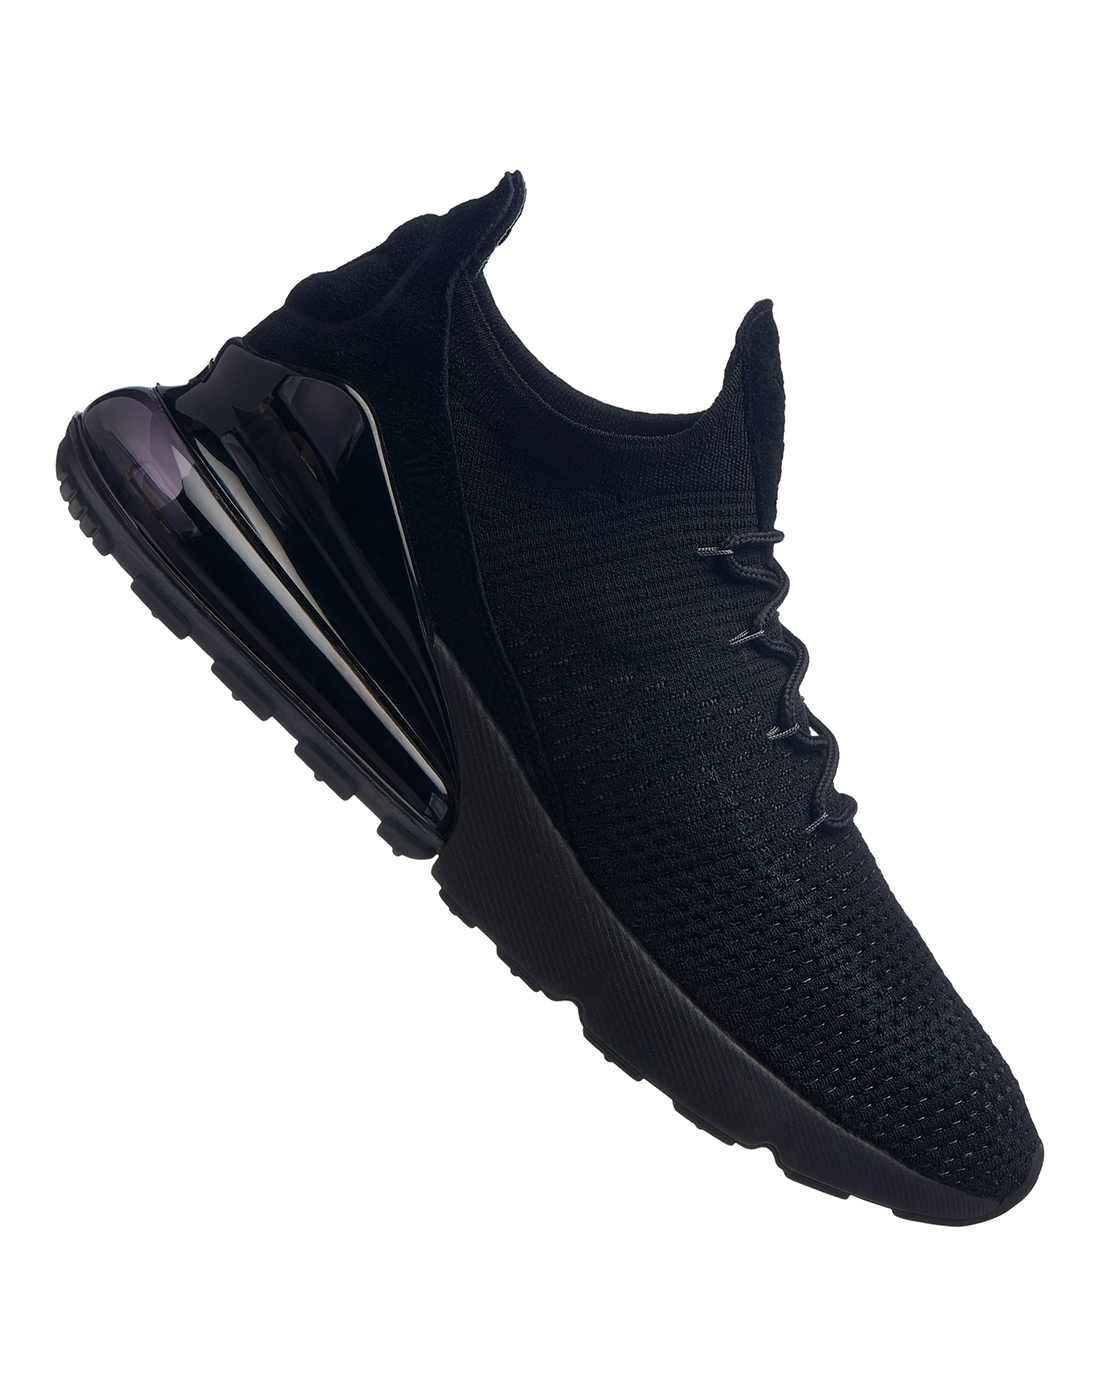 133654f3178f7 Men's Triple Black Nike Air Max 270 Flyknit | Life Style Sports